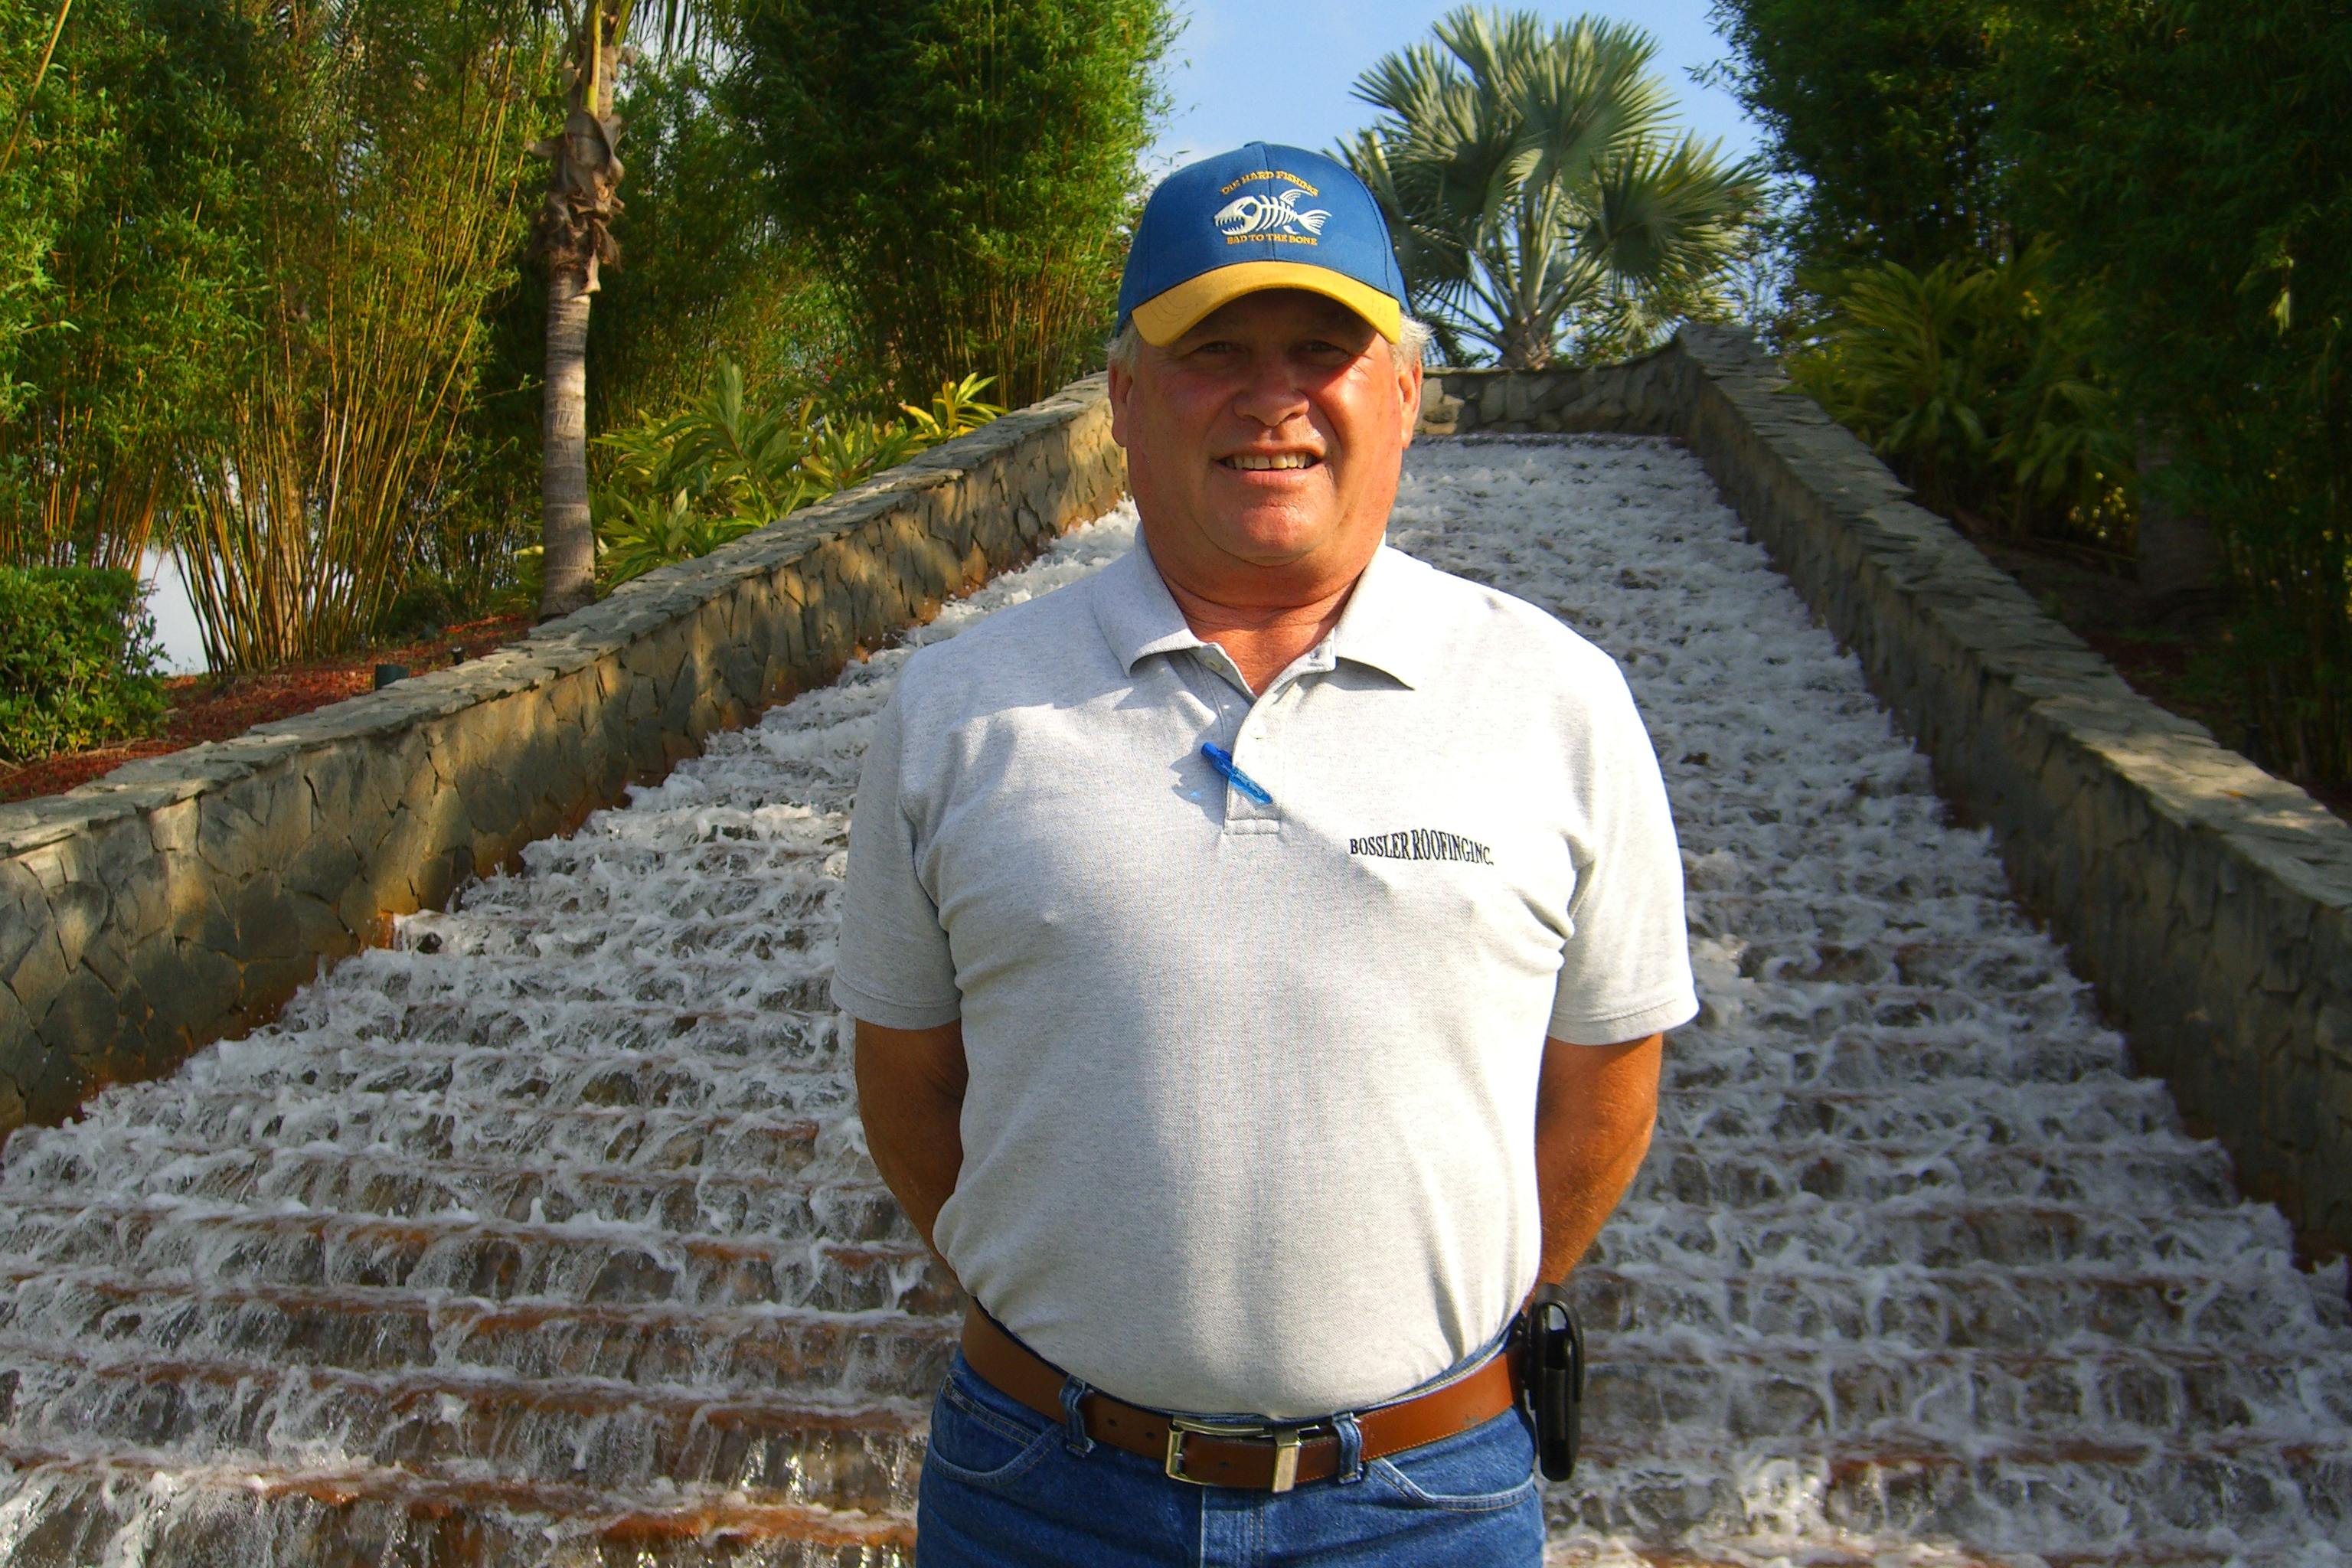 Jim Kalifrath